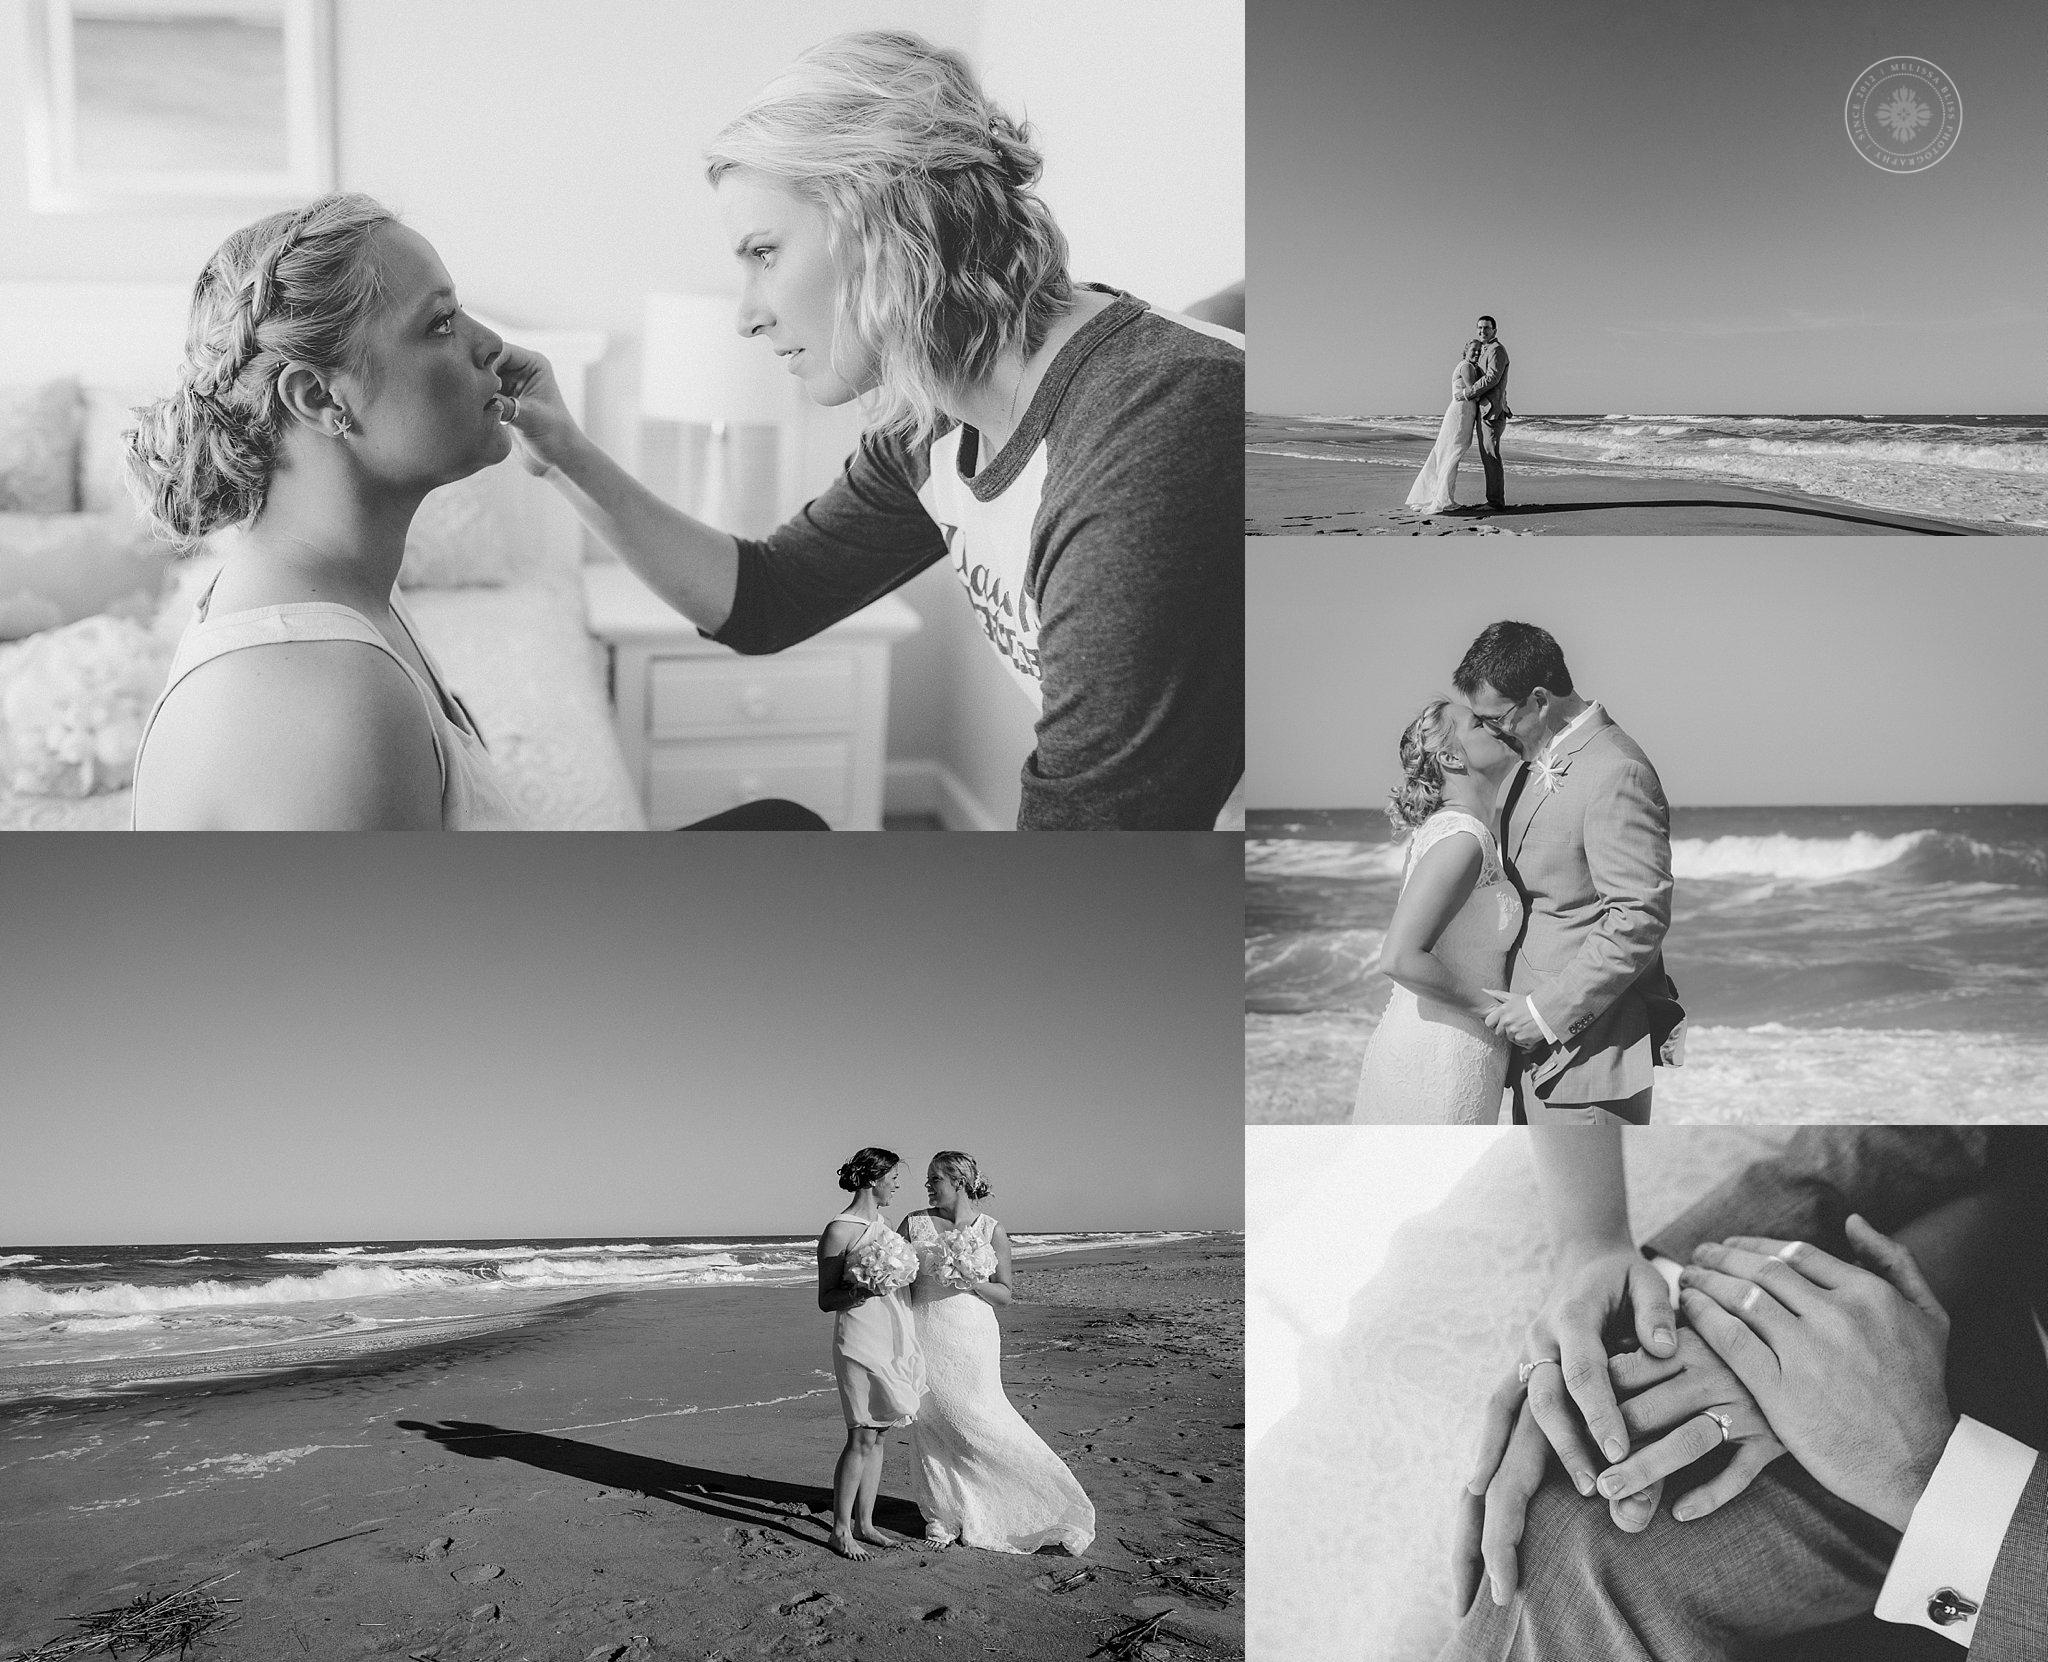 virginia-beach-wedding-photographers-sandbridge-beach-wedding-photographer-melissa-bliss-photography-norfolk-portsmouth-chesapeake-wedding-photographers